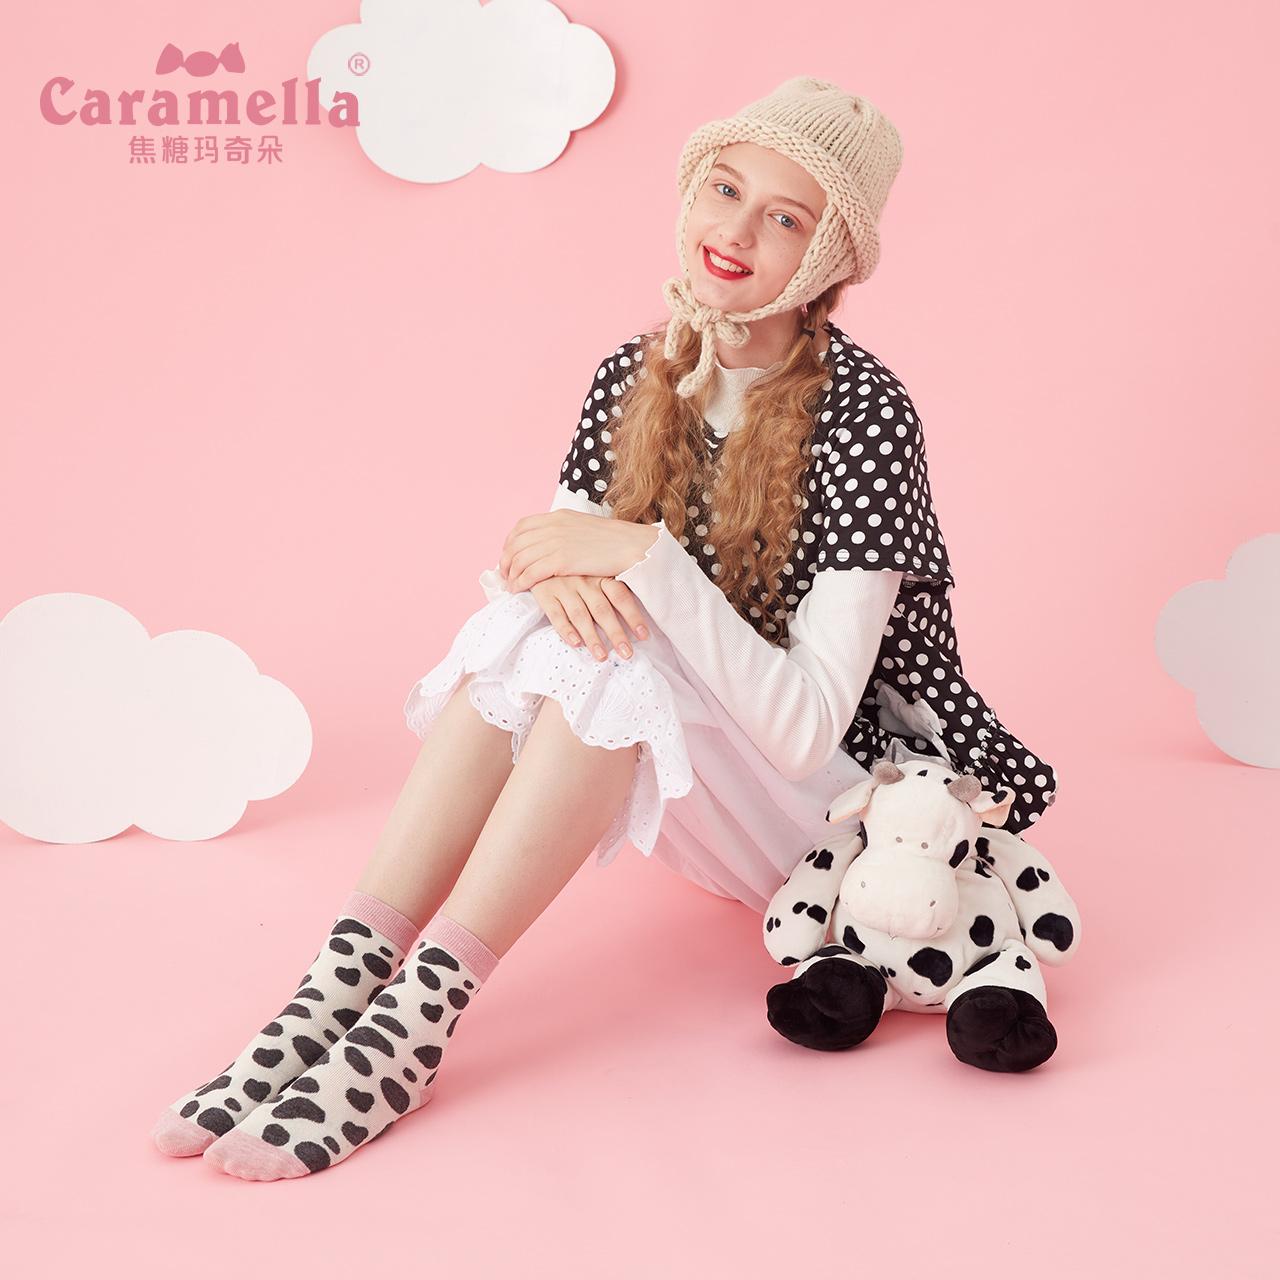 caramella秋冬季堆堆袜日系韩版中筒长袜子女潮棉袜街头原宿ins